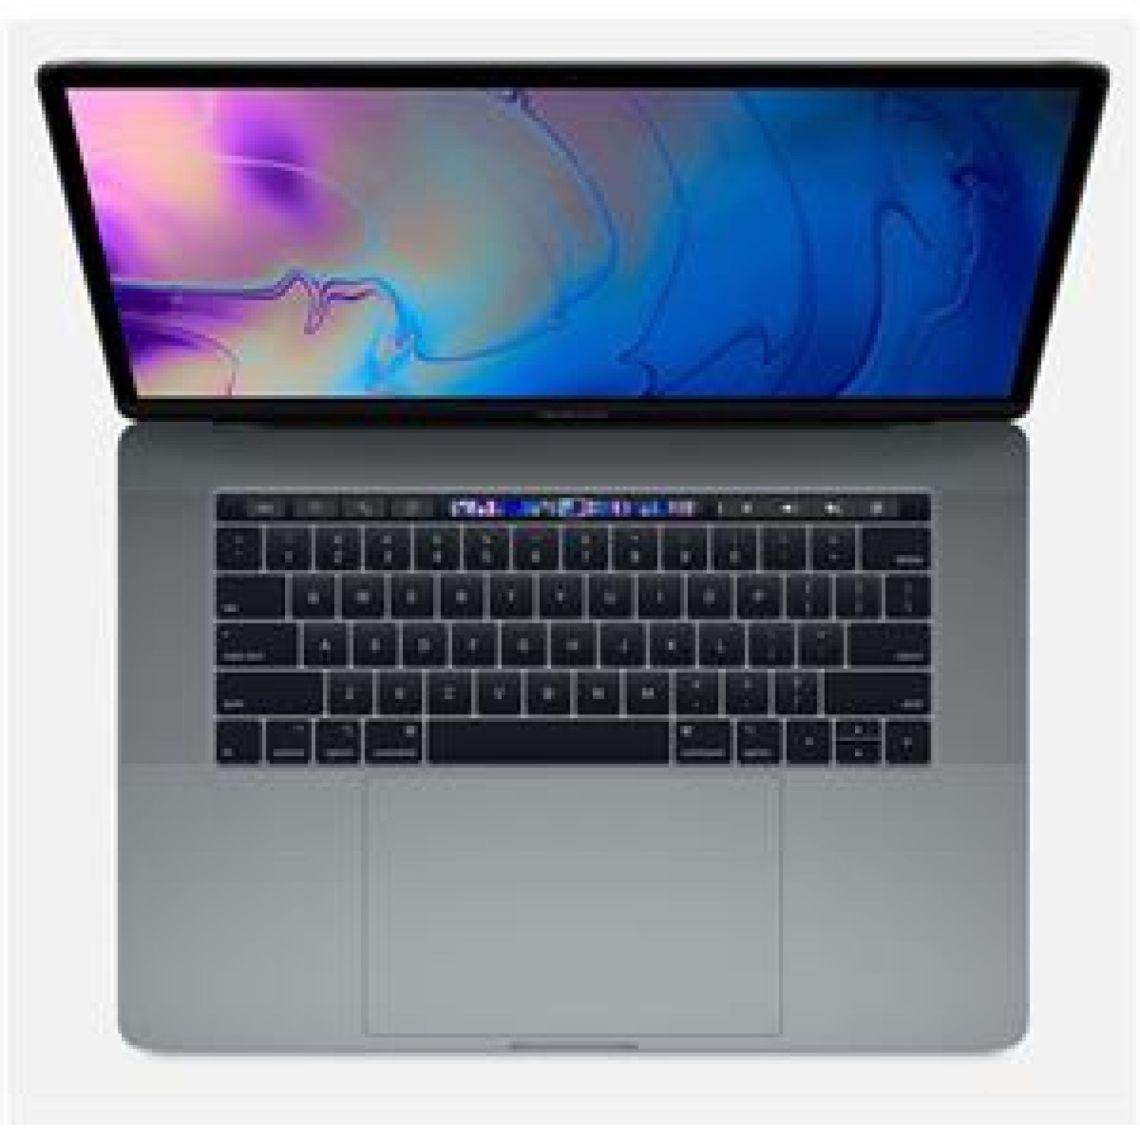 "Apple 15"" MacBook Pro, i7, 16GB RAM, 256GB SSD, macOS High Sierra, Space Gray"